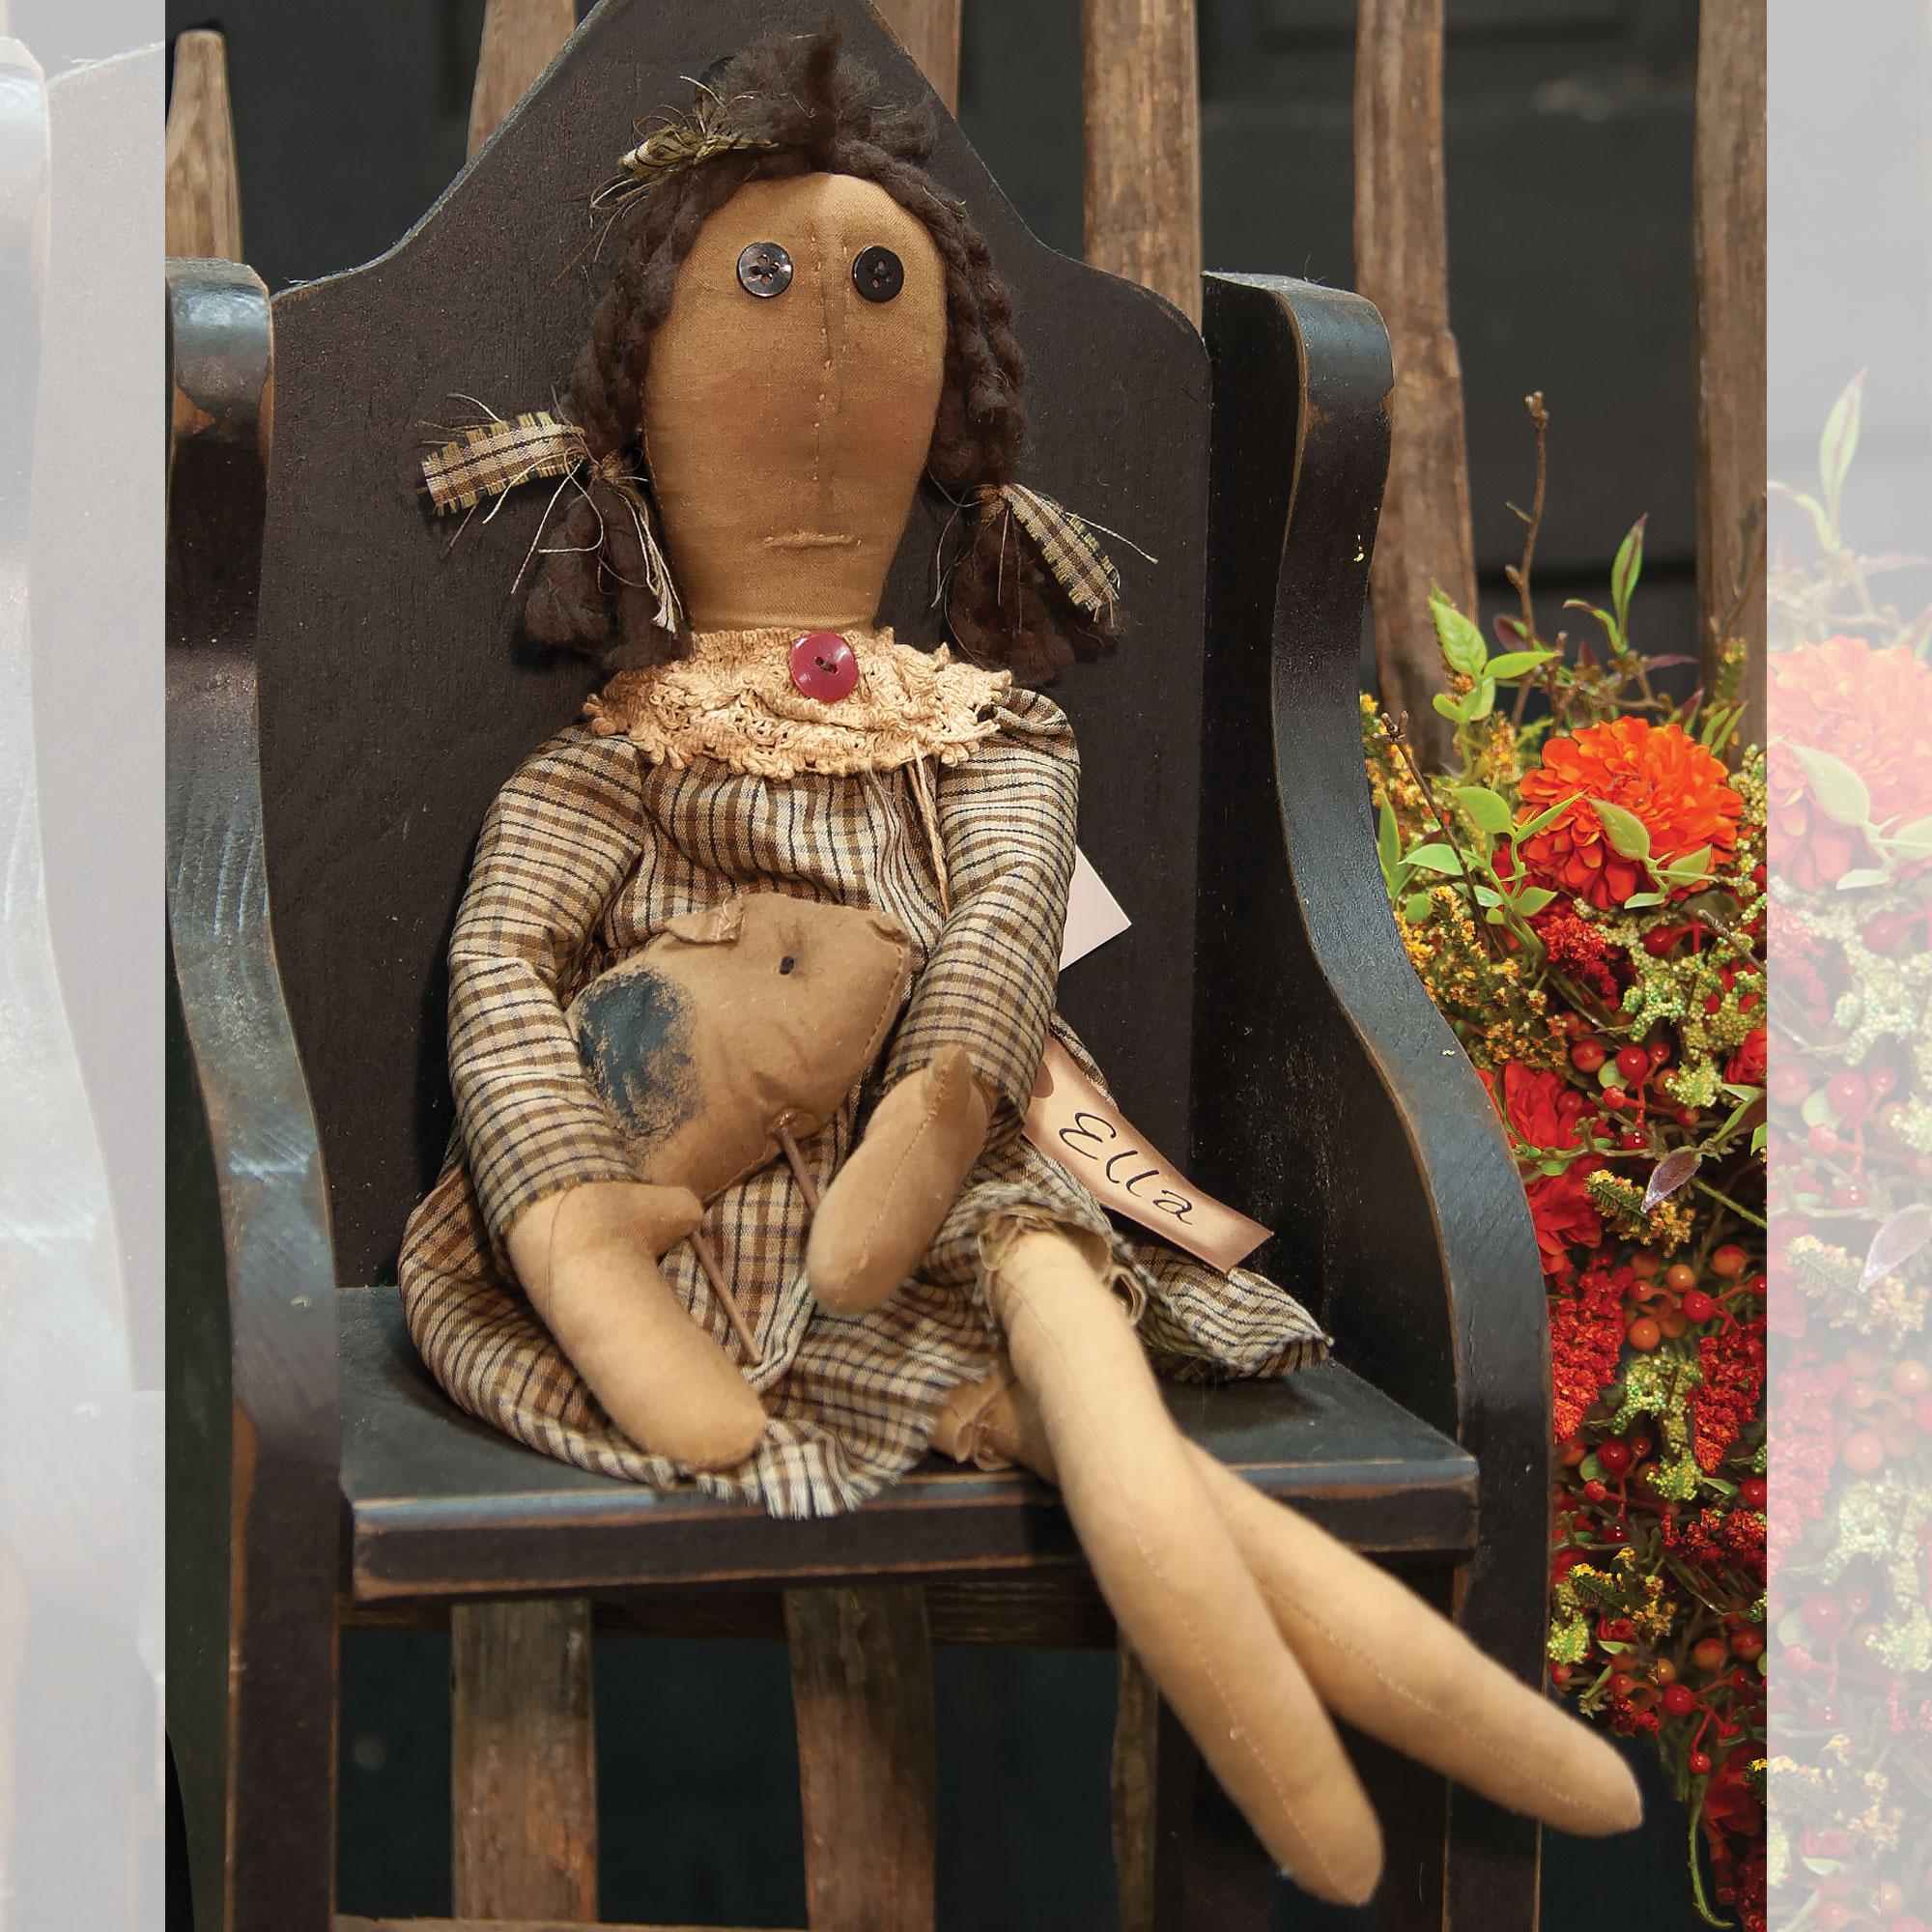 hrs-cs36614-ella-doll-lrg